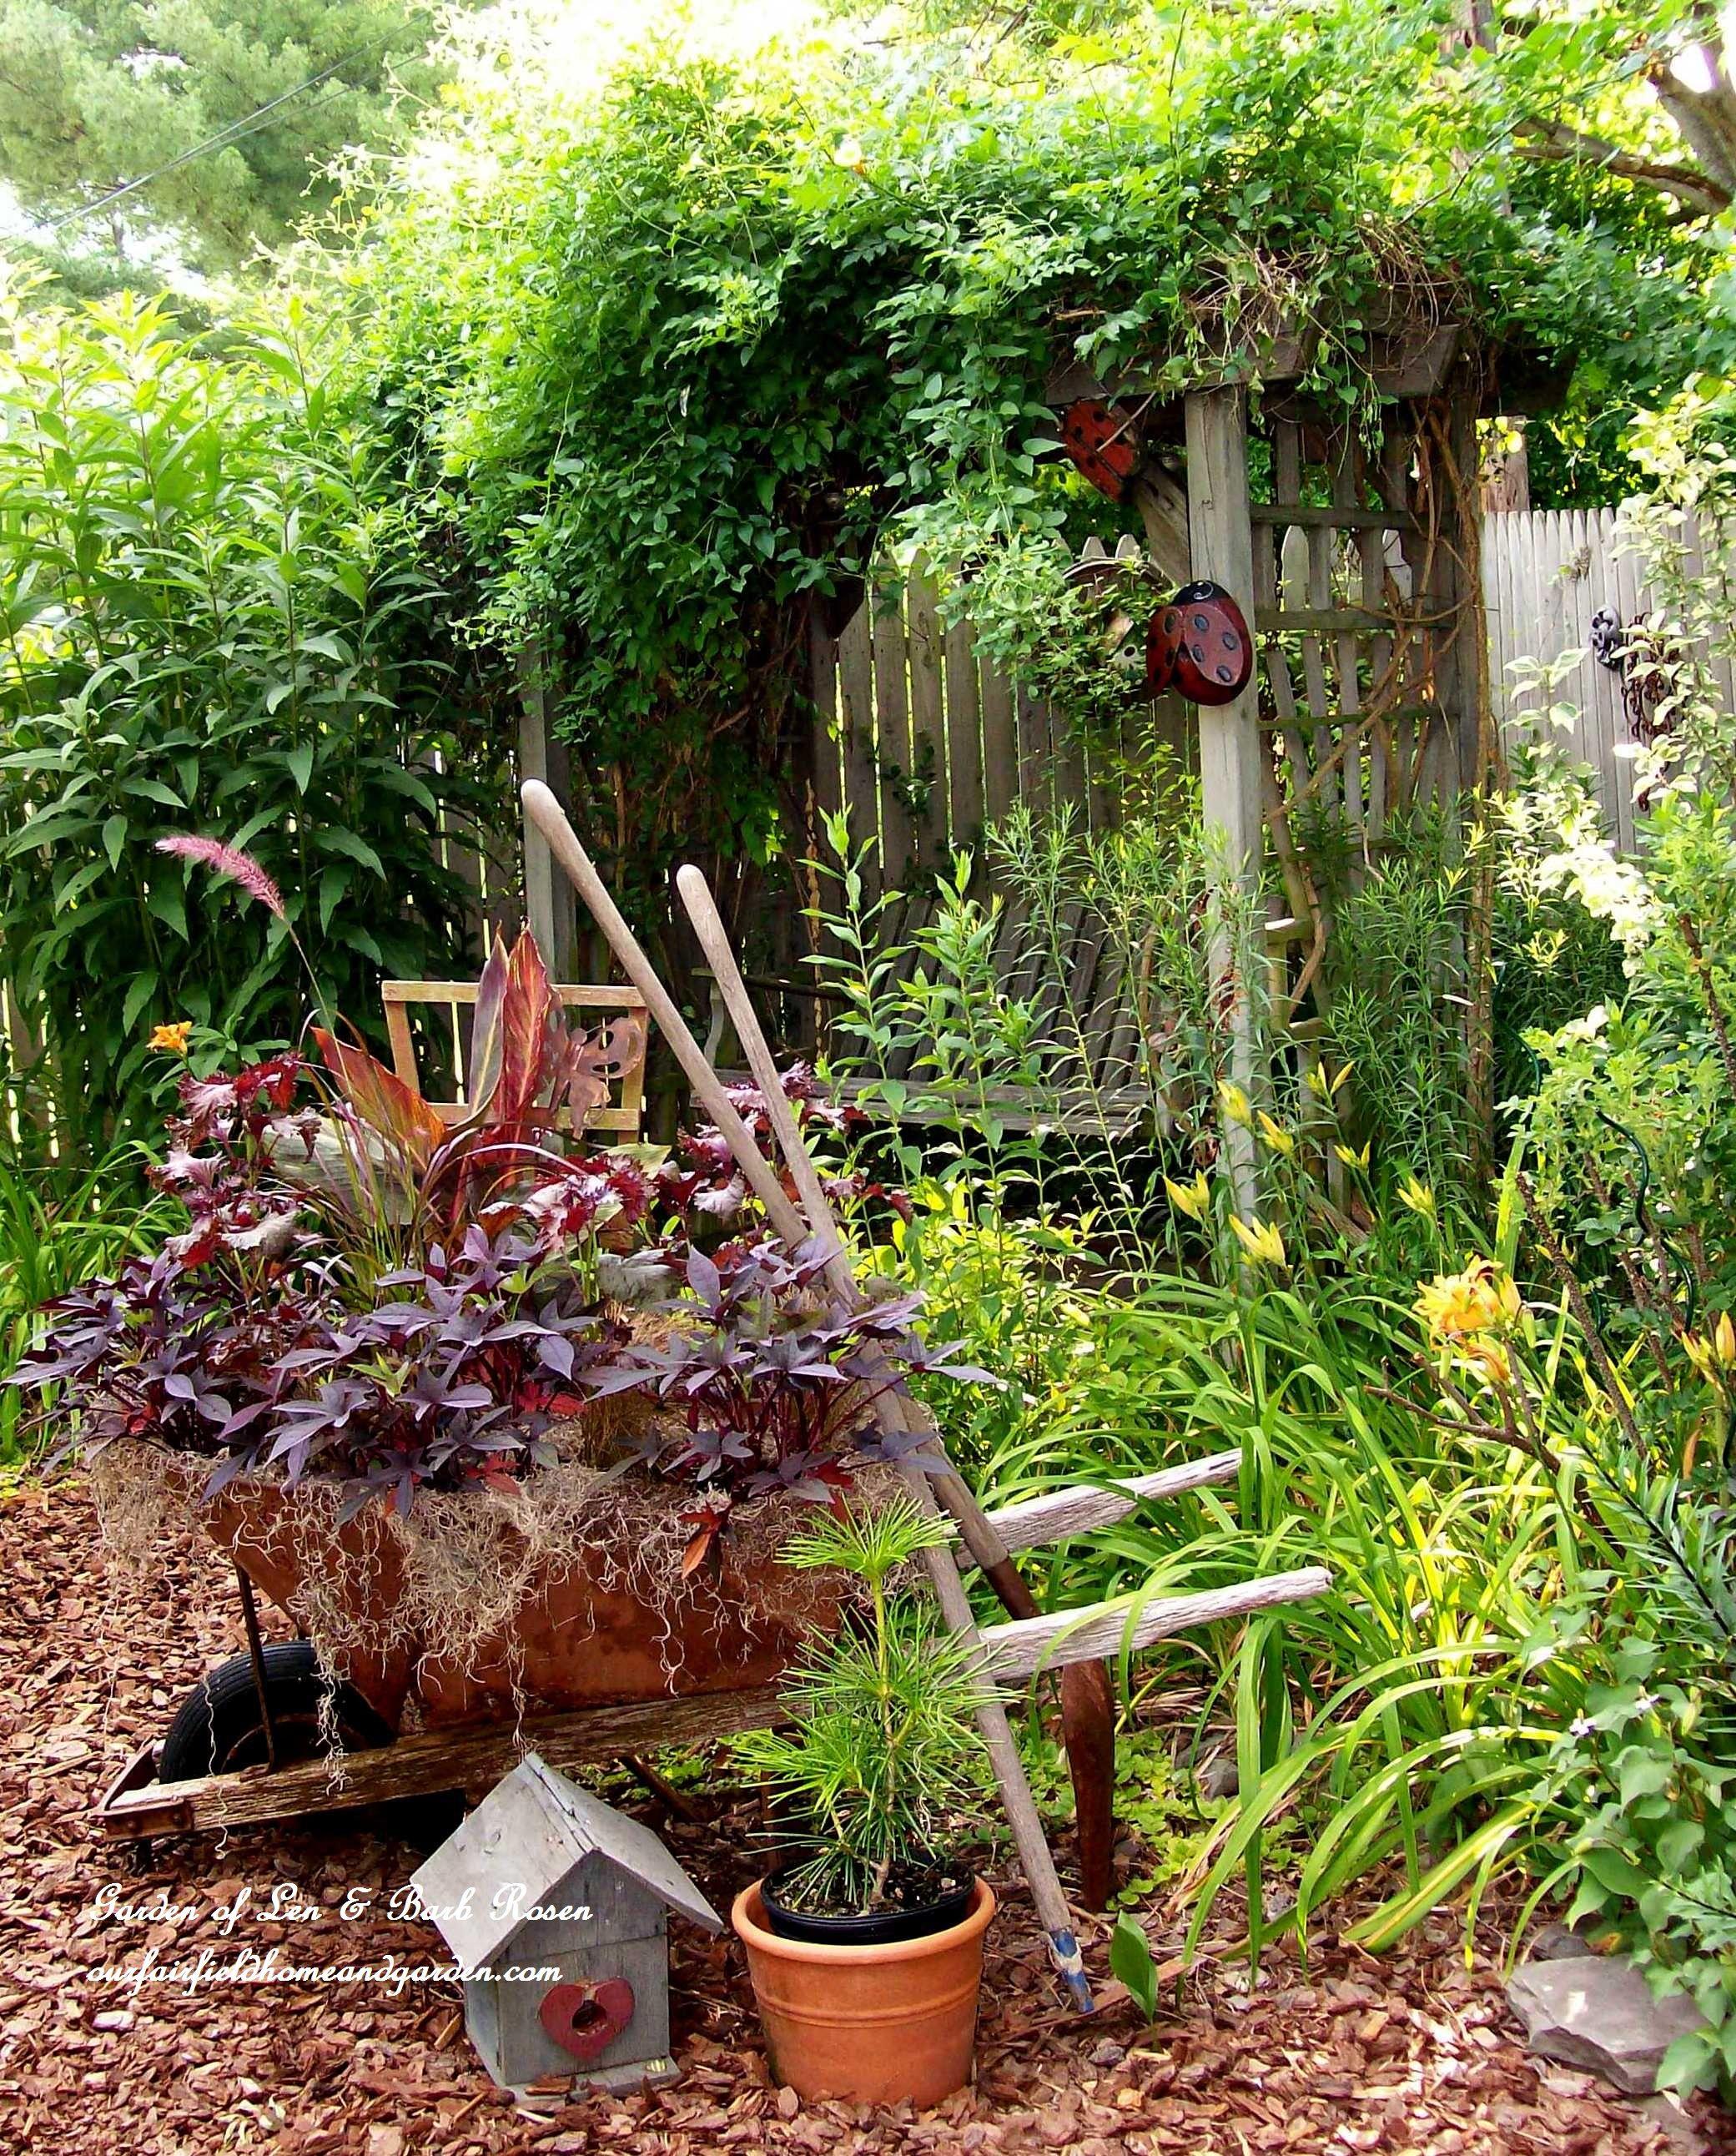 Wheelbarrow planting and arbor swing garden of len u barb rosen